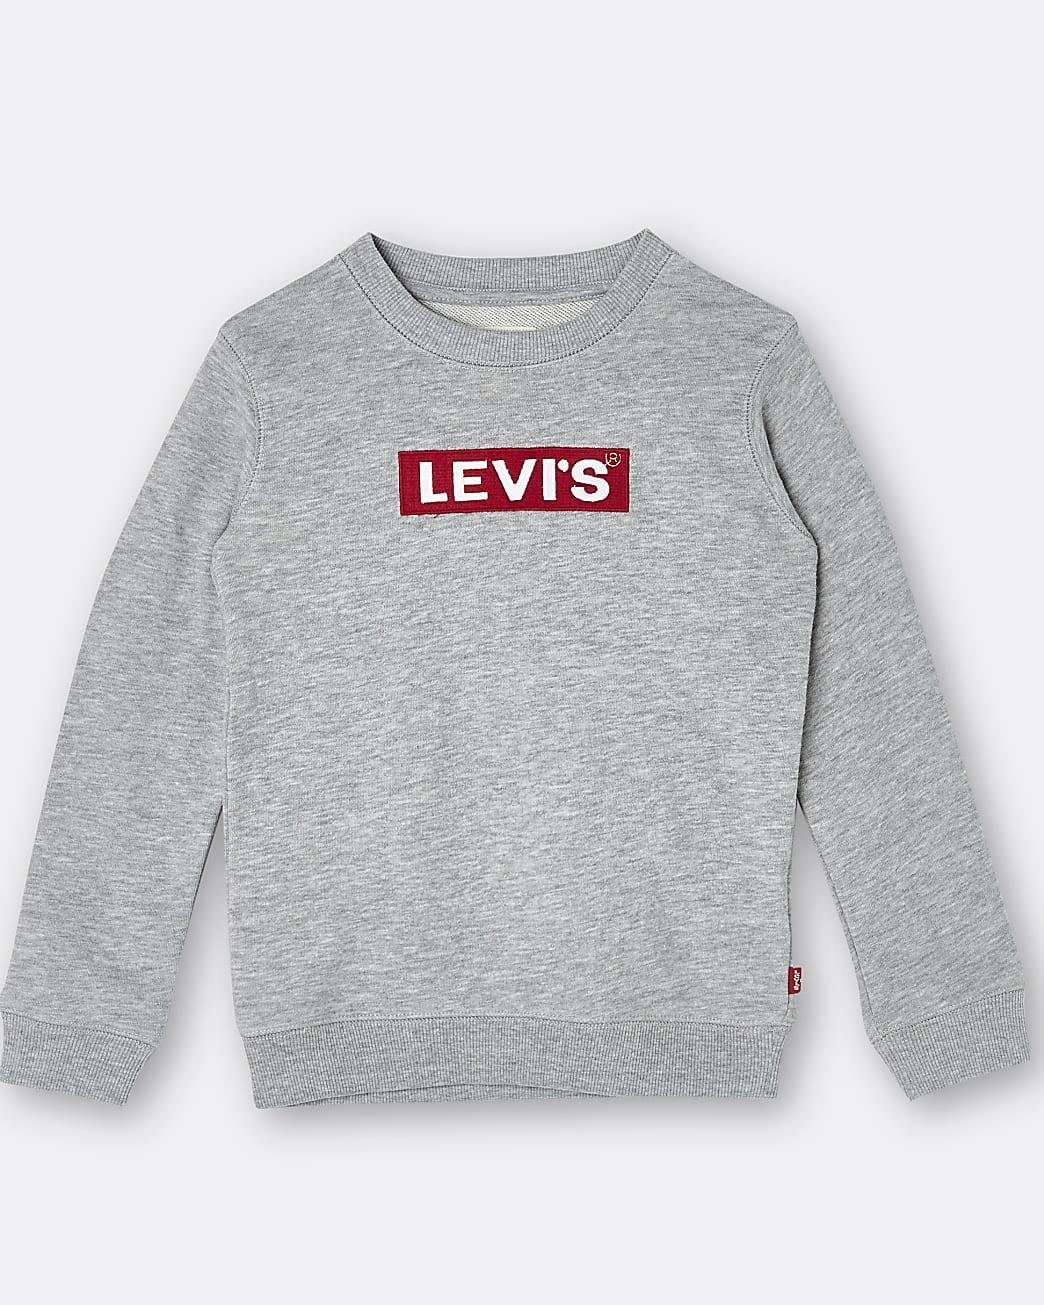 Boys grey Levi's sweatshirt